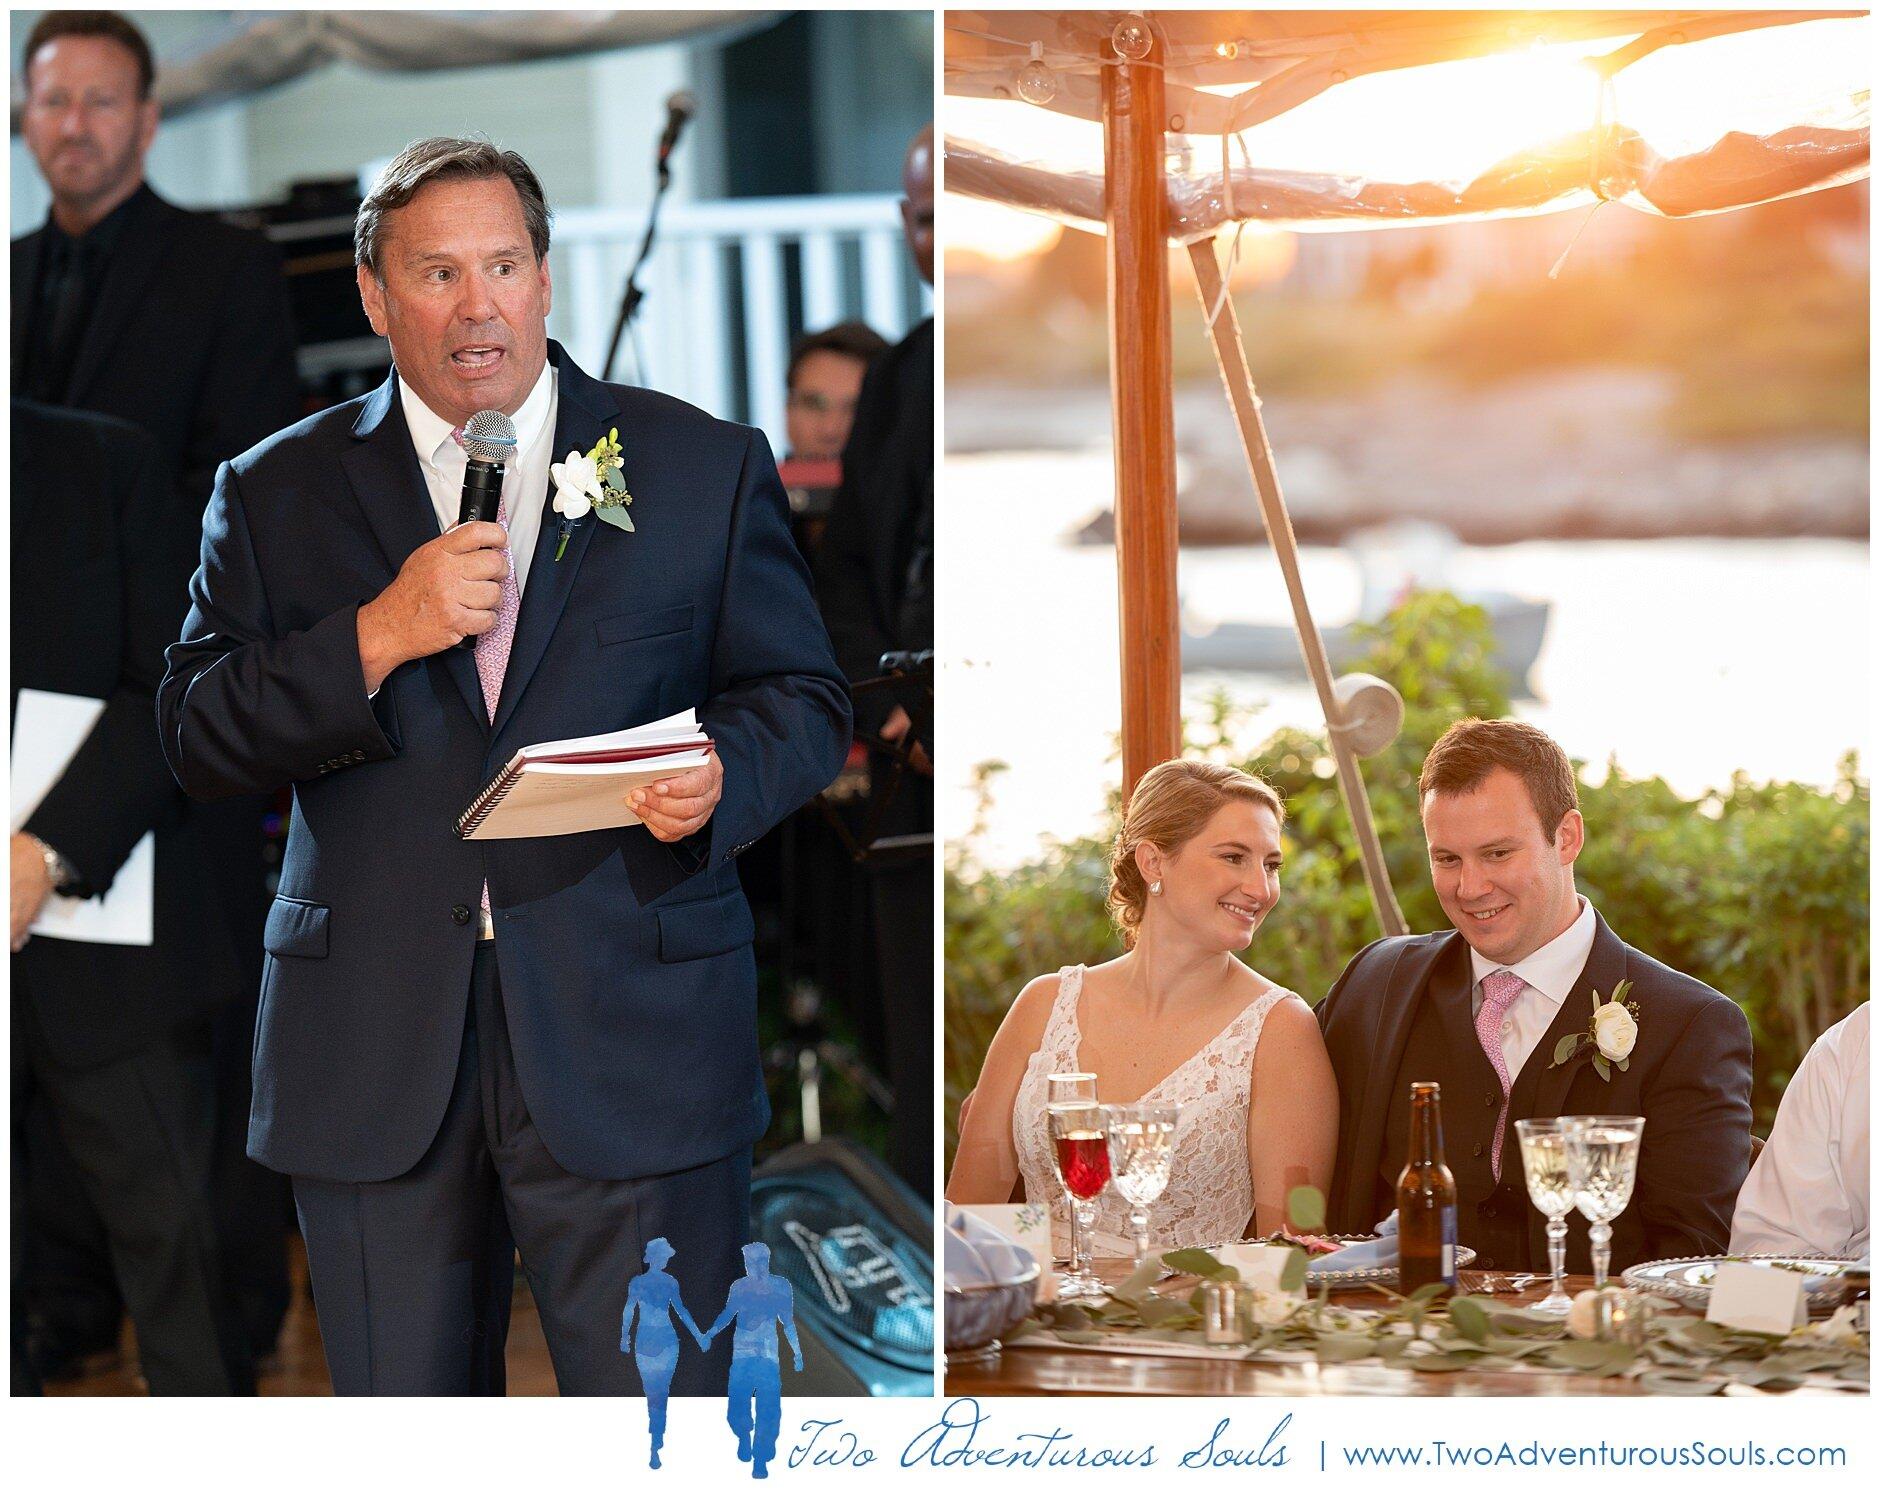 Breakwater Inn and Spa Wedding Photographers, Kennebunkport Wedding Photographers, Two Adventurous Souls- 092119_0049.jpg